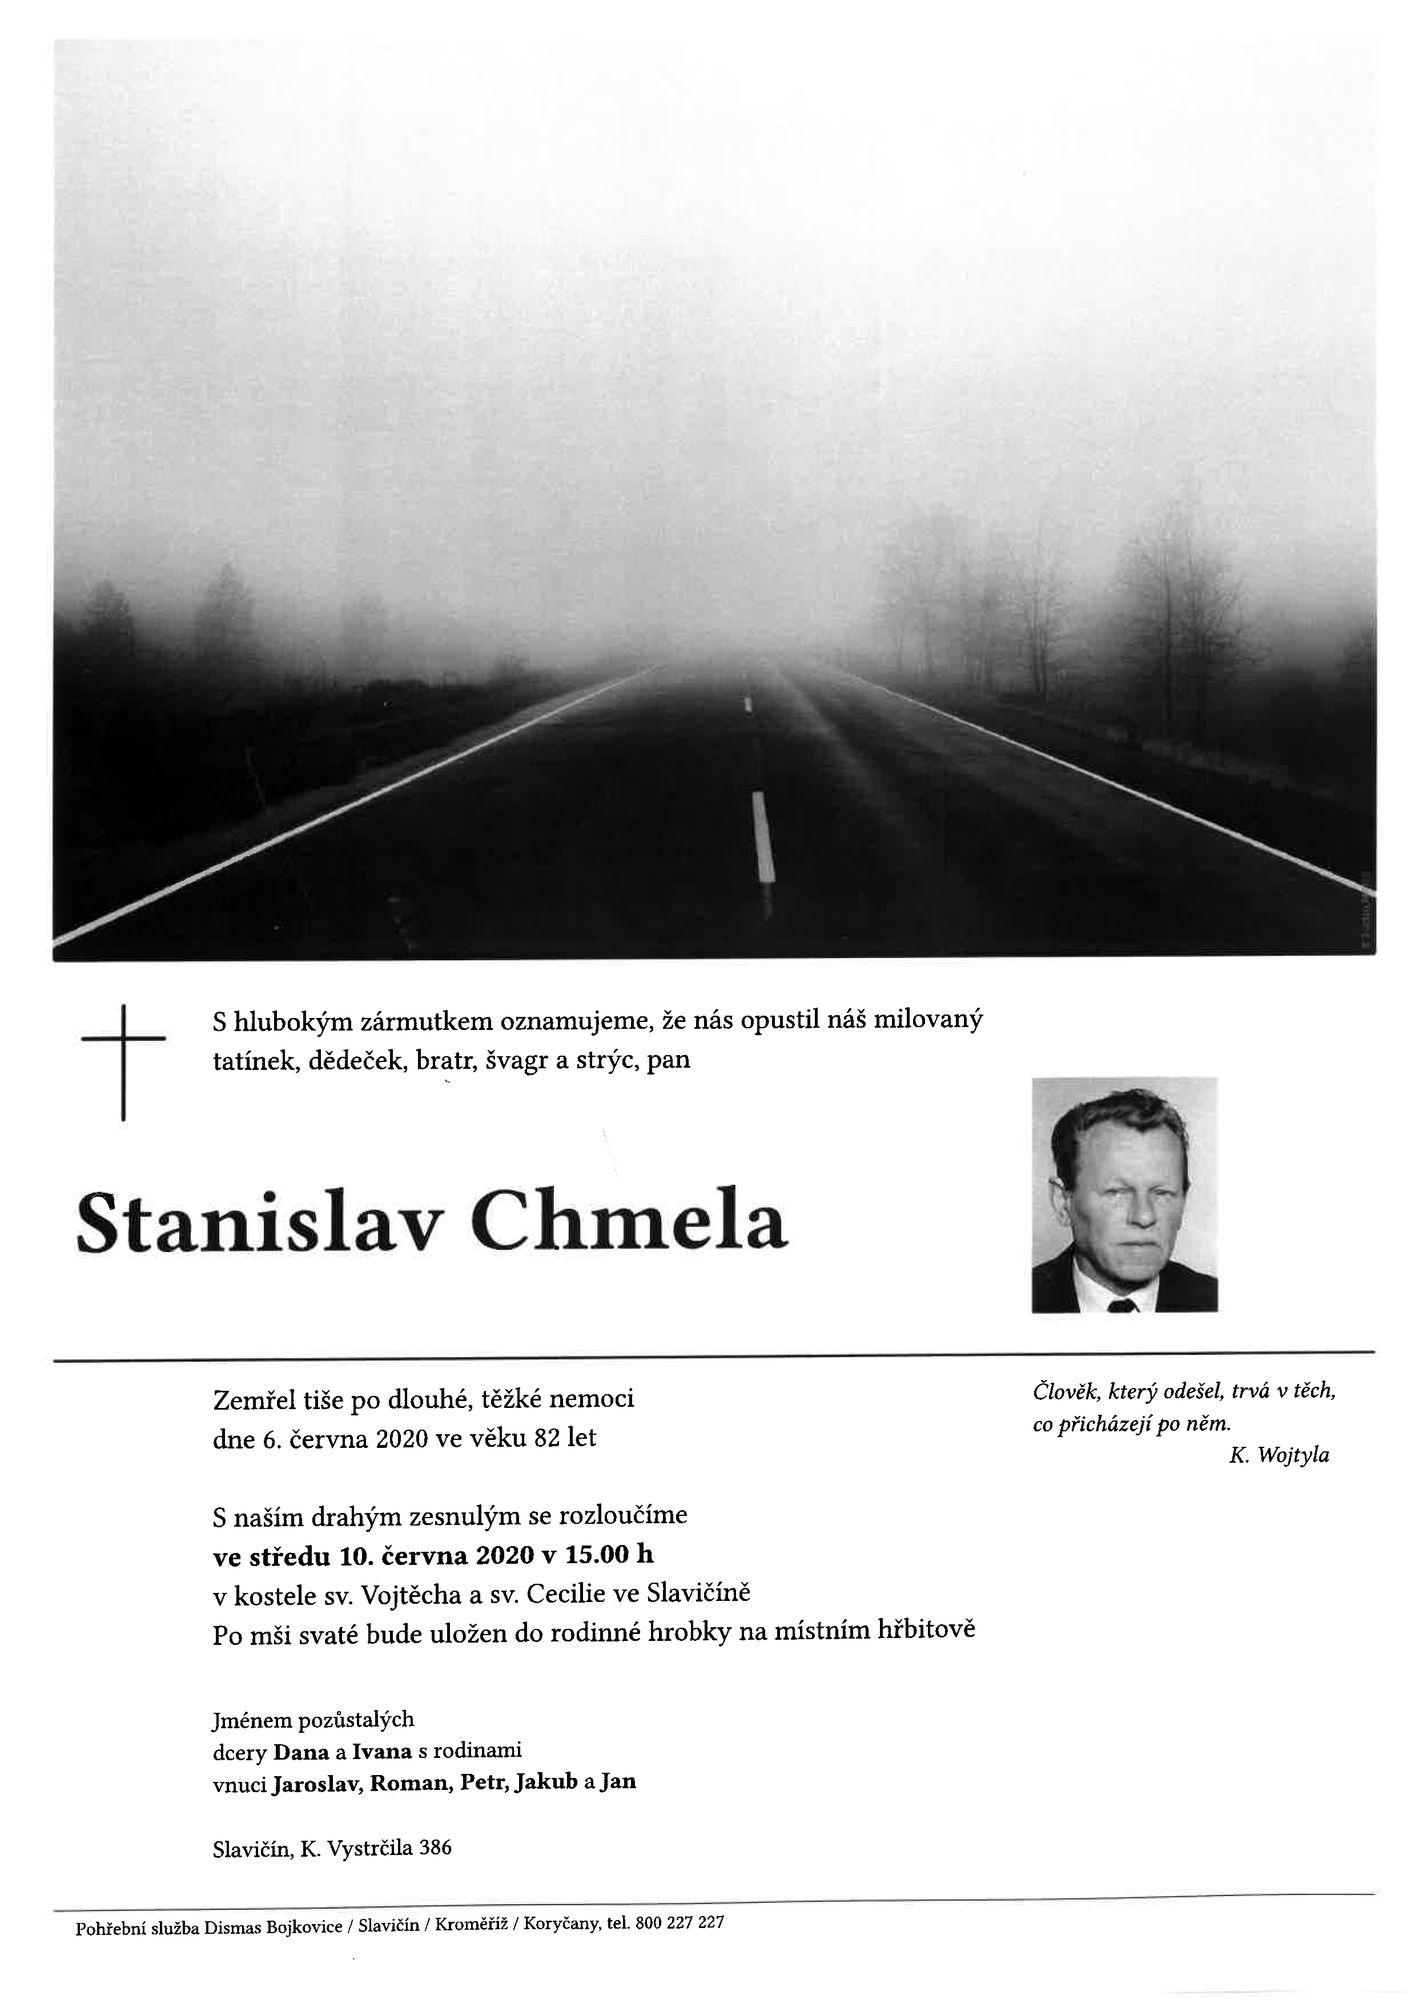 Stanislav Chmela